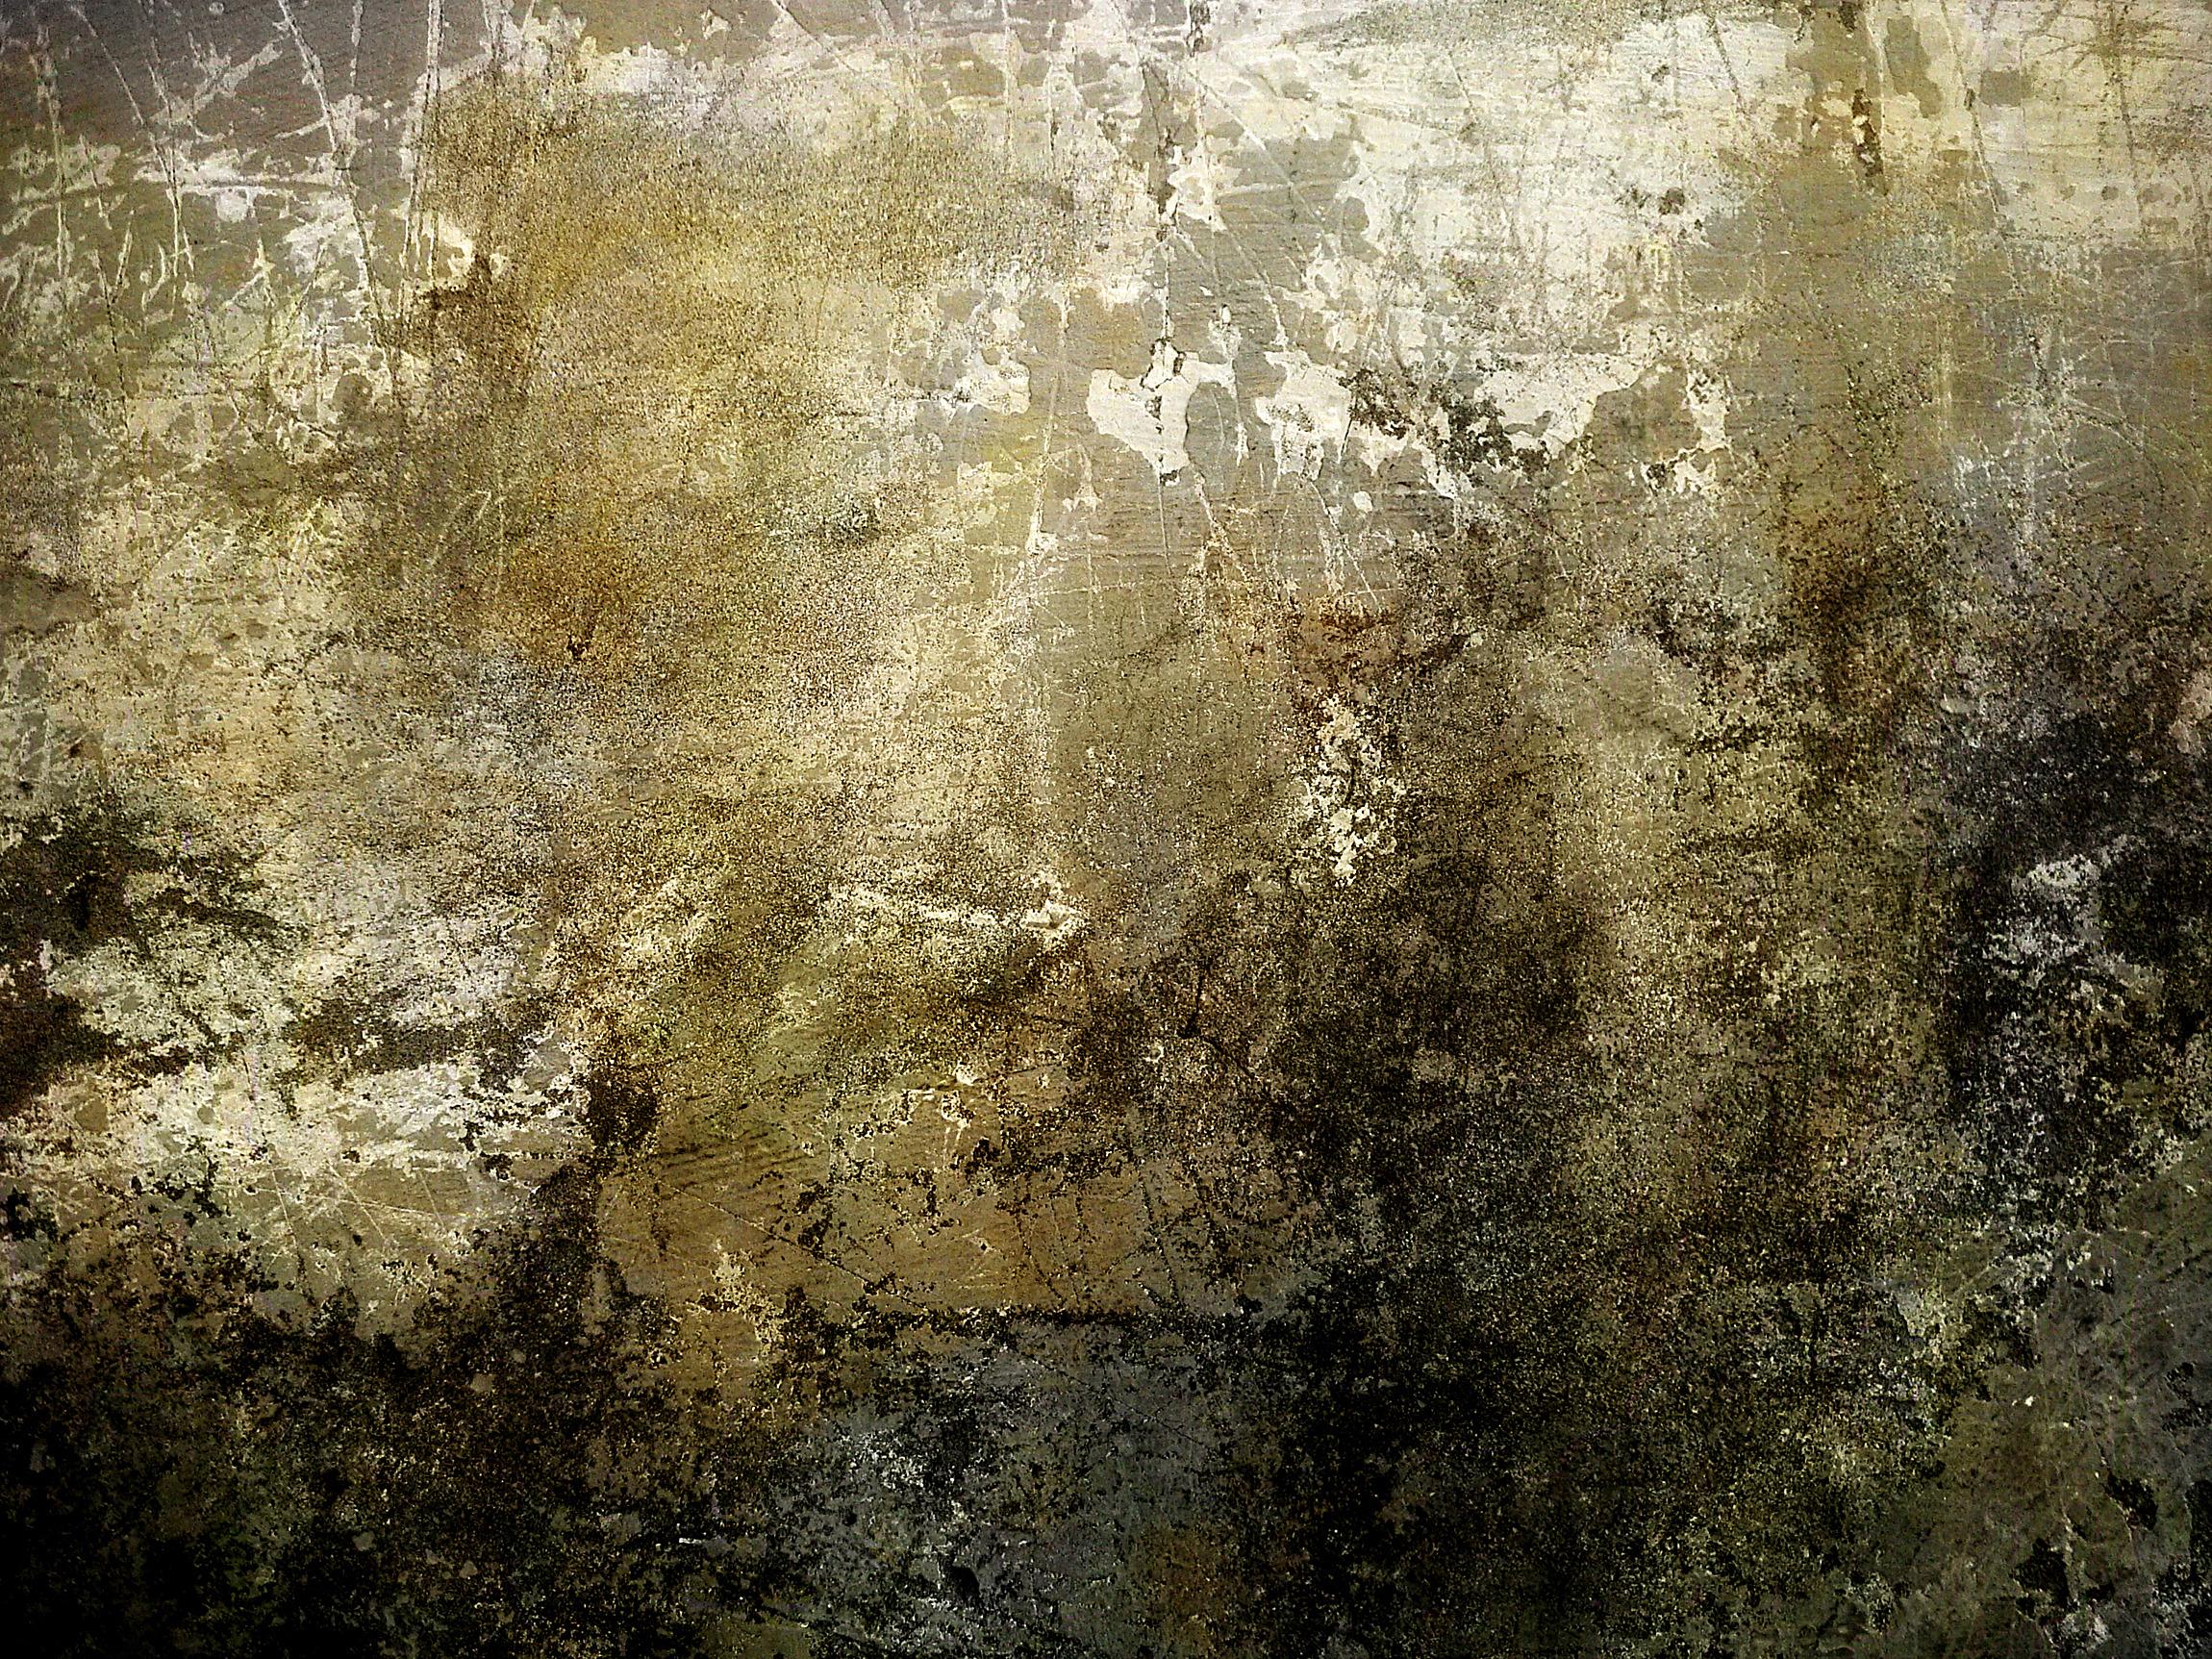 grunge background 1013tm pic 3056   Paul Raymond 2300x1725